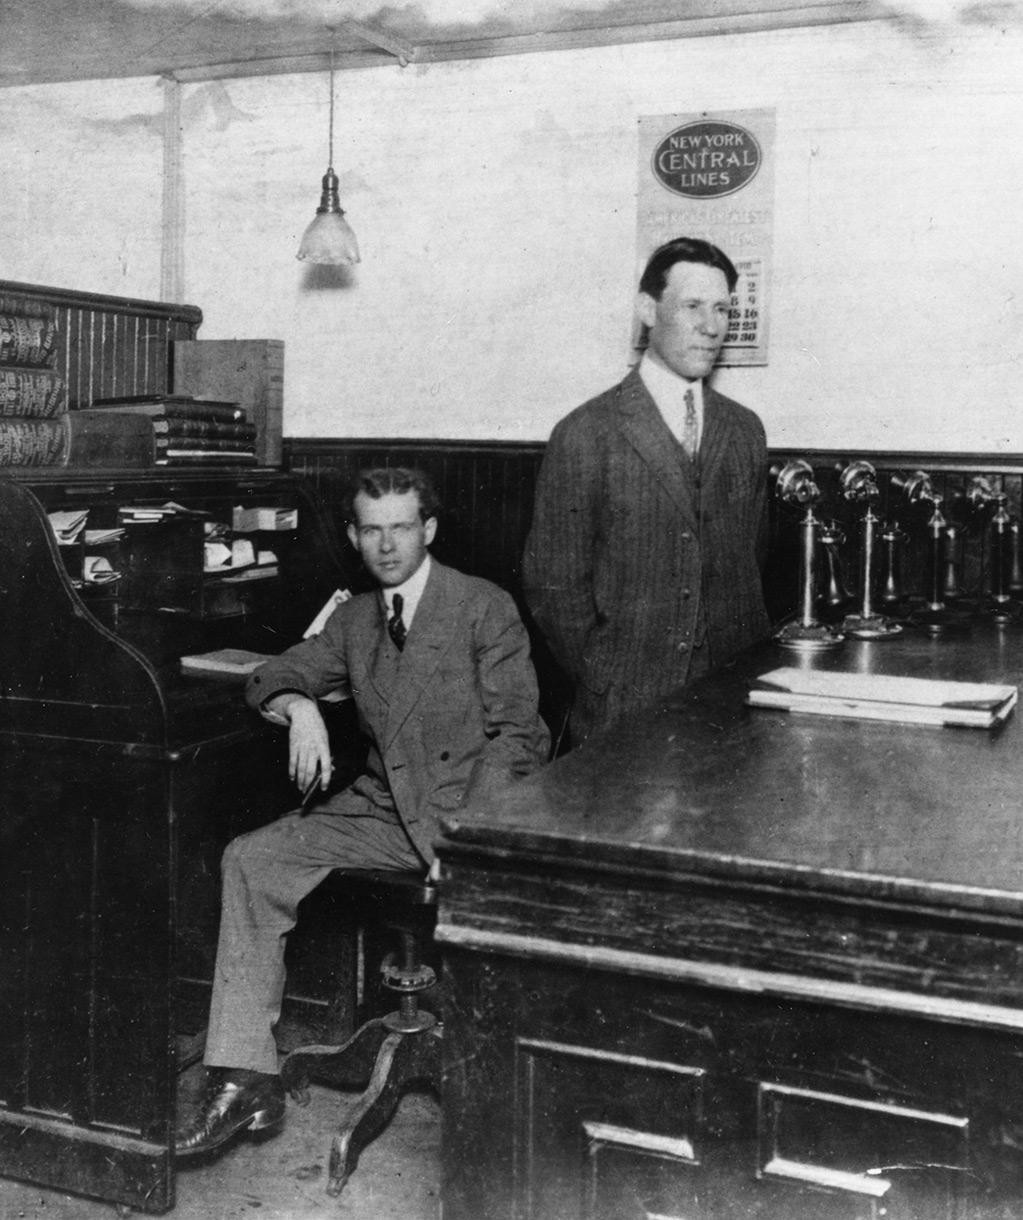 UPS'in kurucusu Jim Casey, Seattle'deki ilk ofisinde